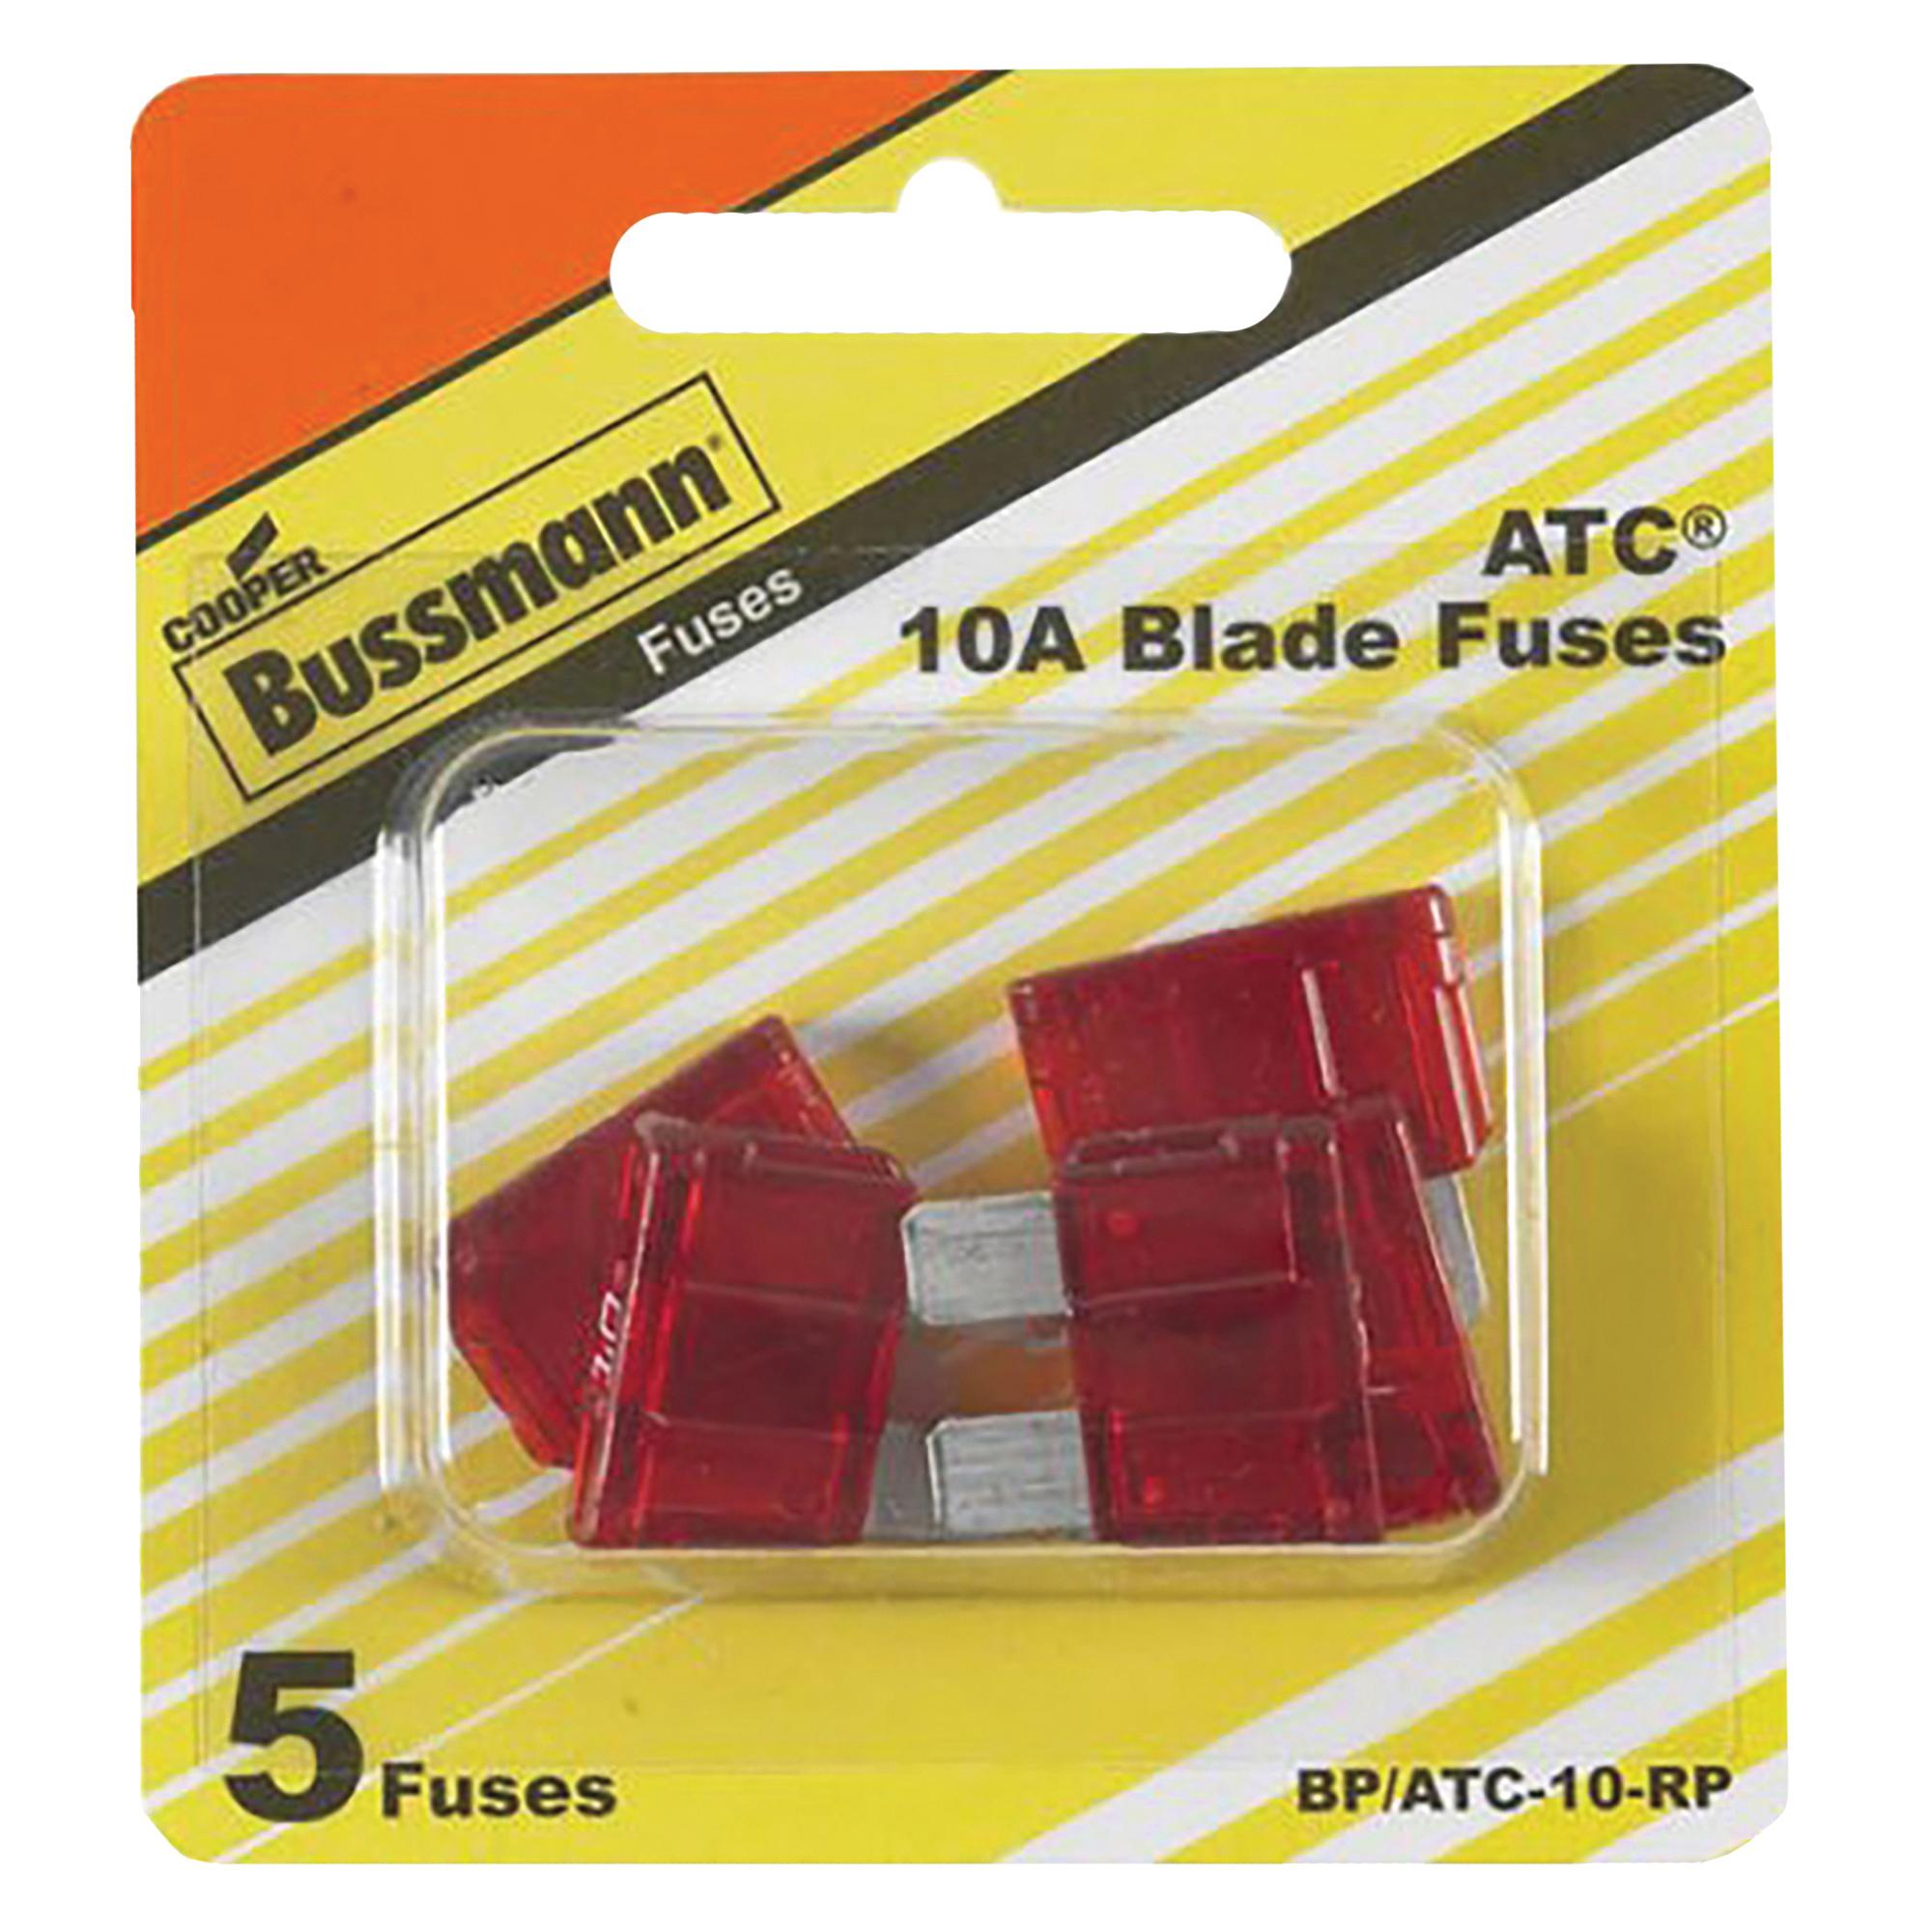 Picture of Bussmann BP/ATC-10-RP Blade Fuse, 32 VDC, 10 A, 1 kA Interrupt